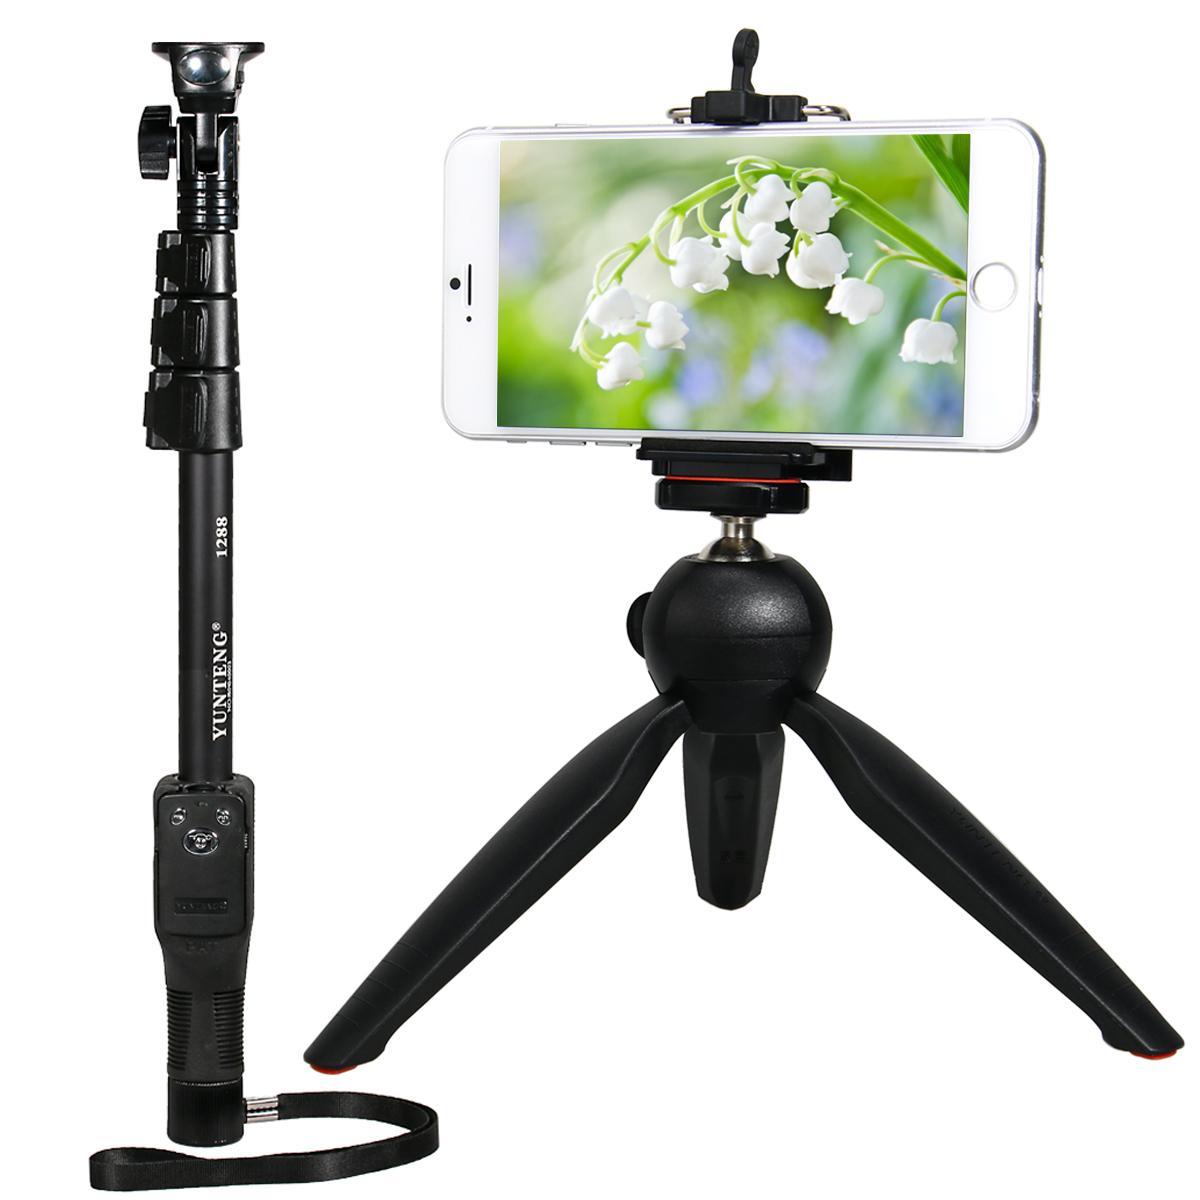 Yunteng Selfie Stick Bluetooth Wired Remote Shutter Handheld Monopod Tongsis Wireless Aeproductgetsubject